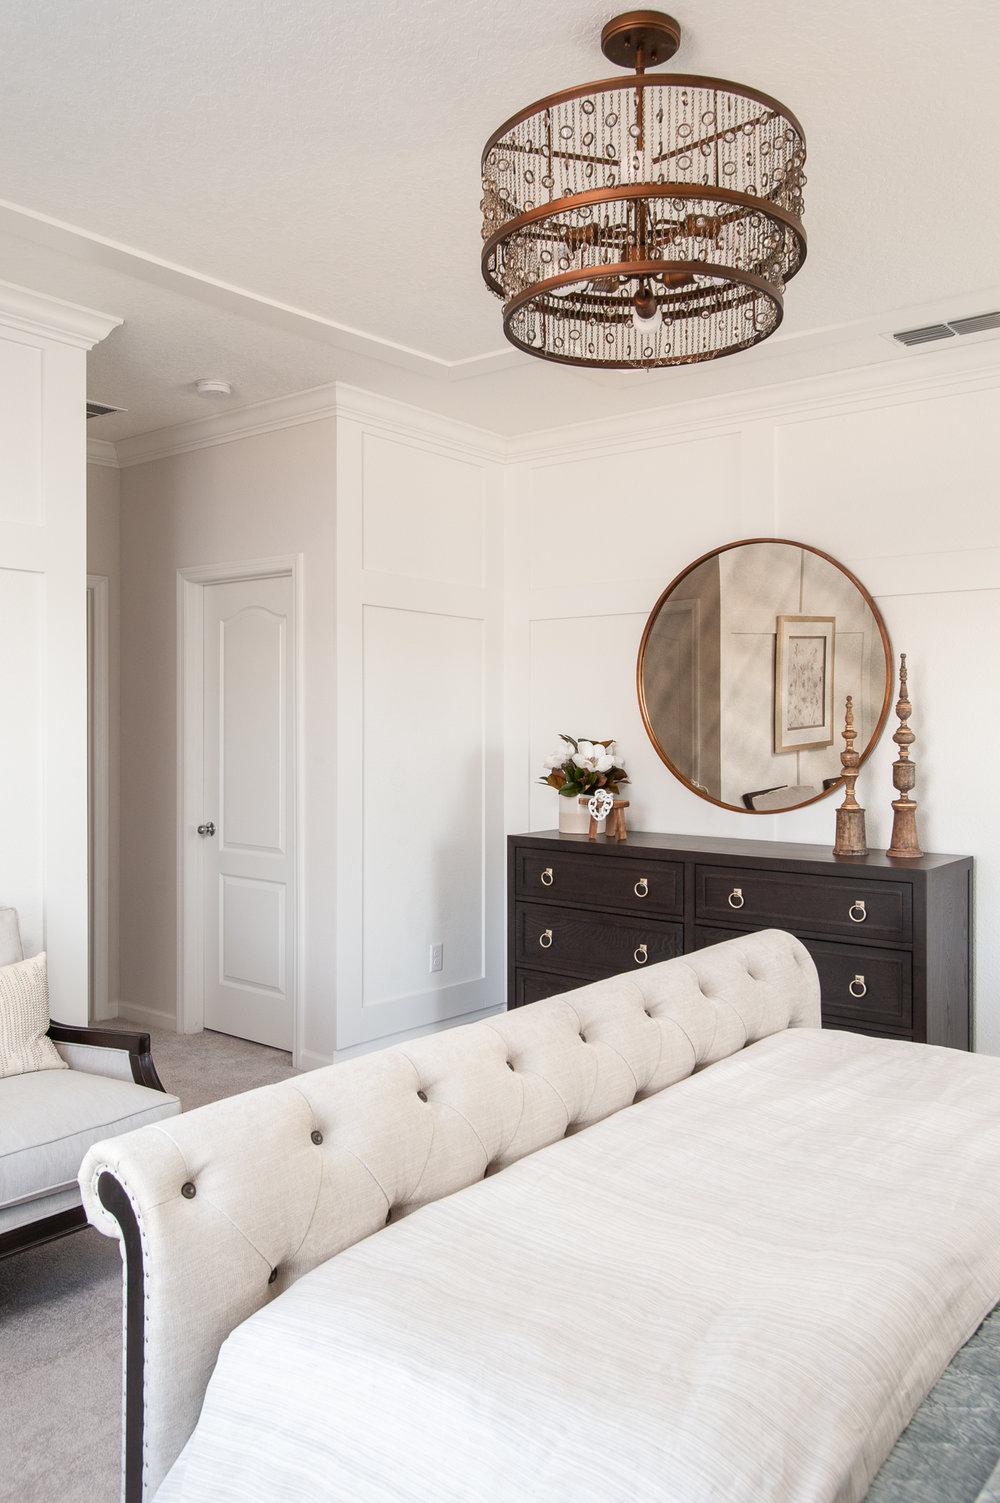 Micamy_Interior Designer_Design_Interior_Model_Merchandising_Owners_Suite_Universal_Furniture_Traditional_Transitional_Dresser_Bronze_Bedroom_Vanity.jpg